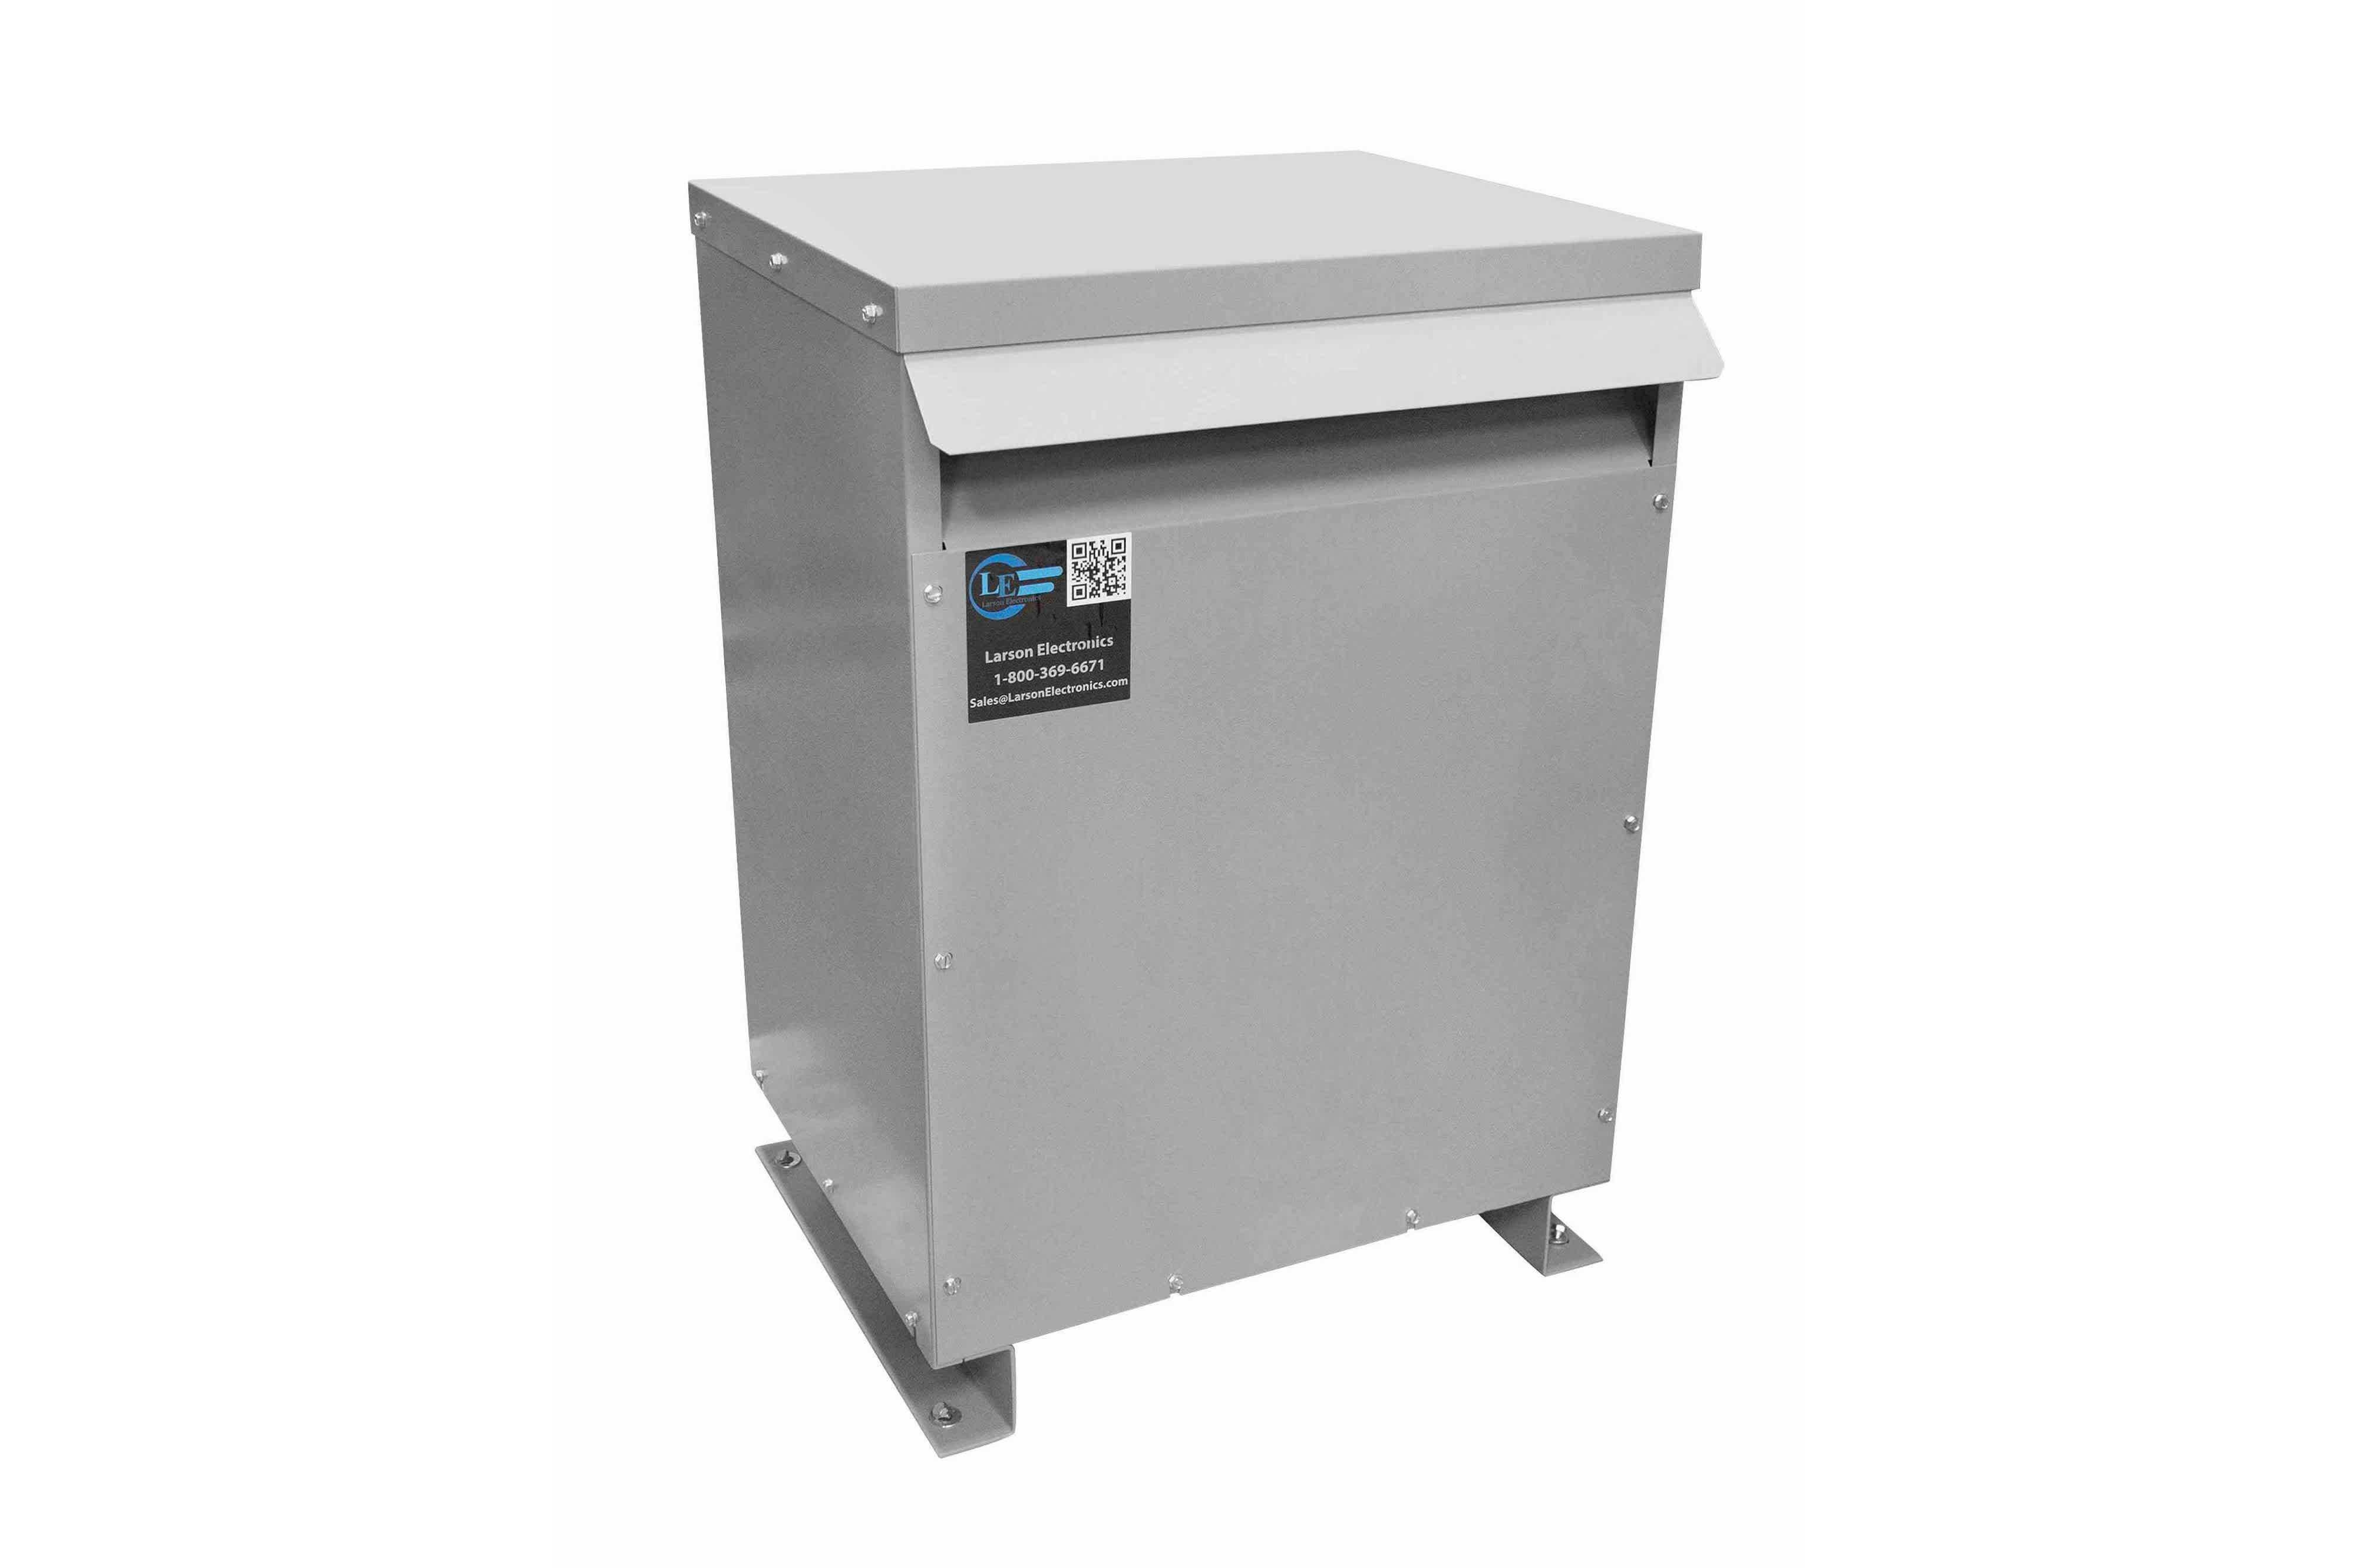 137.5 kVA 3PH Isolation Transformer, 480V Wye Primary, 415V Delta Secondary, N3R, Ventilated, 60 Hz